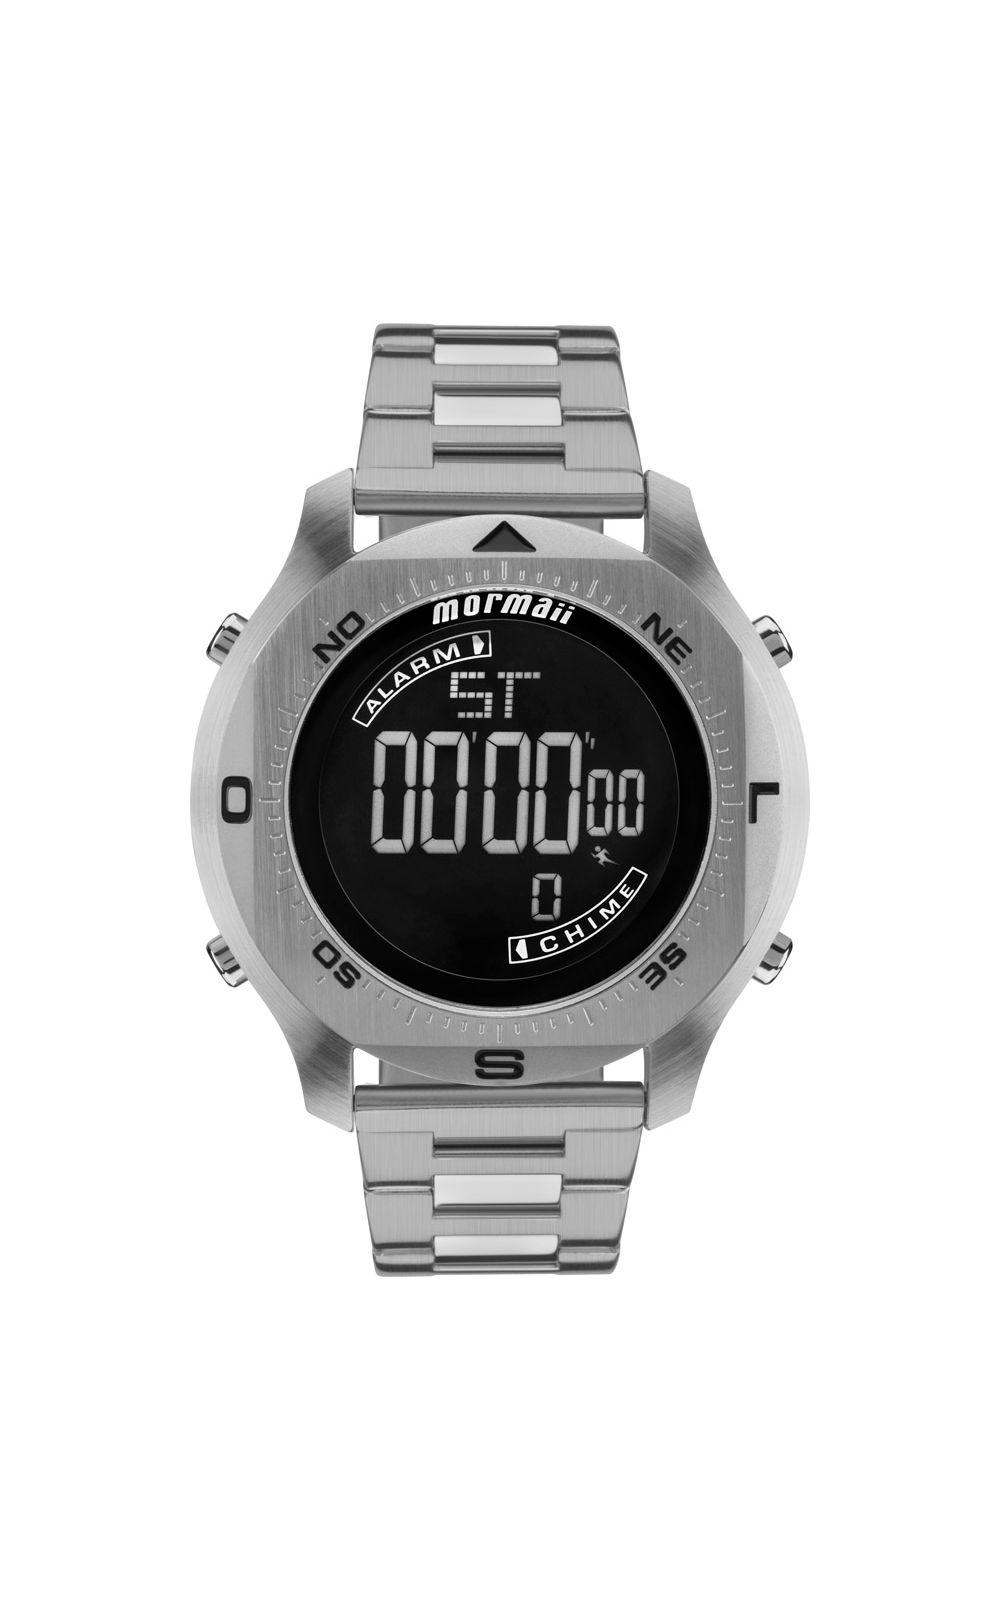 899cbc04076b2 Relógio Mormaii Masculino Acqua Pro Prata - MO11273C 1P